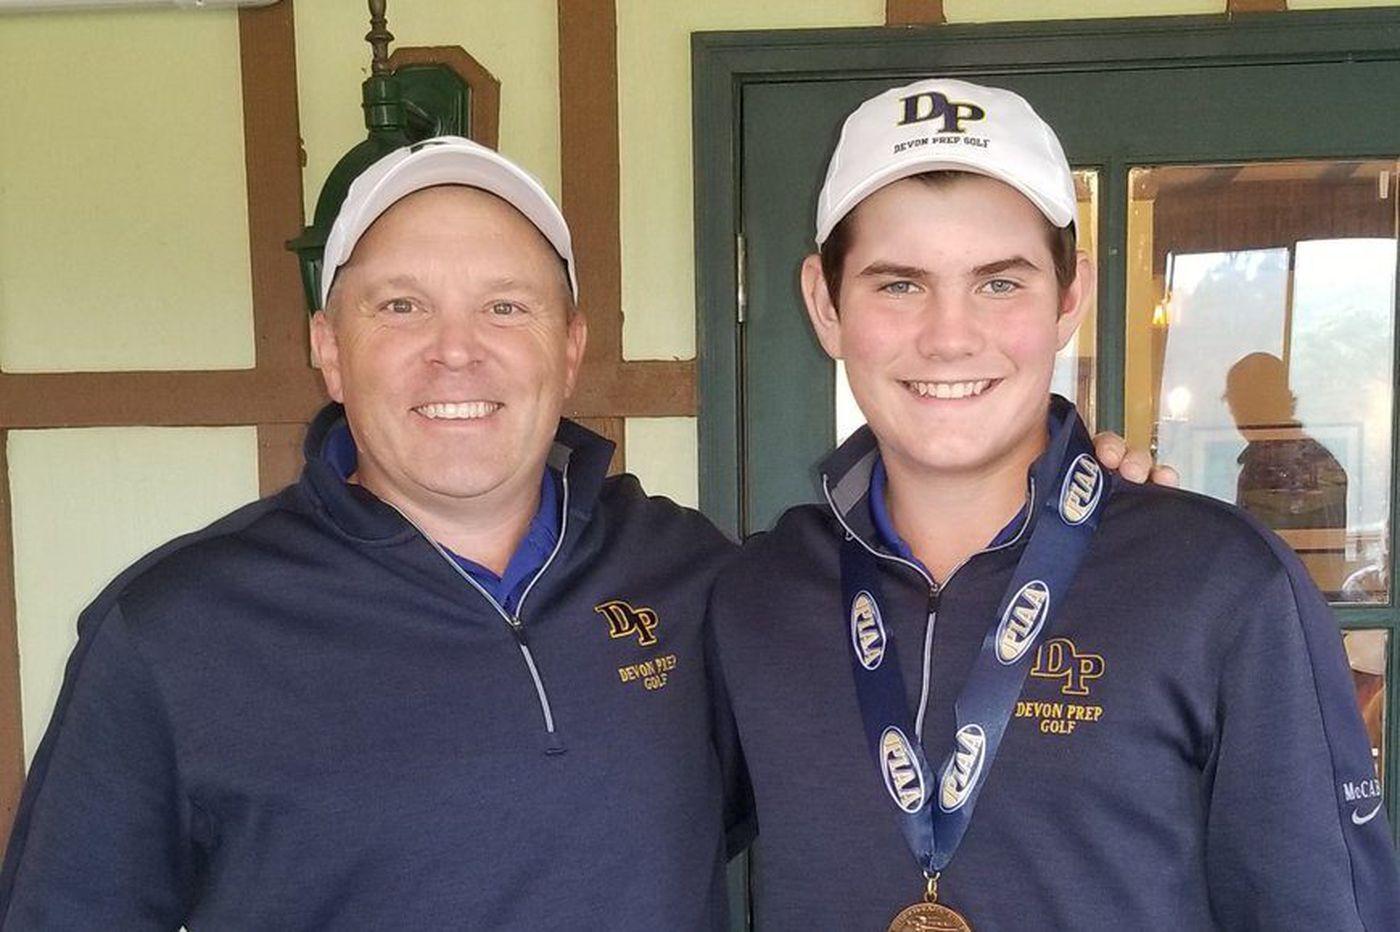 Monday's Southeastern Pa. roundup: Devon Prep golfer Ryan McCabe qualifies for PIAA championships